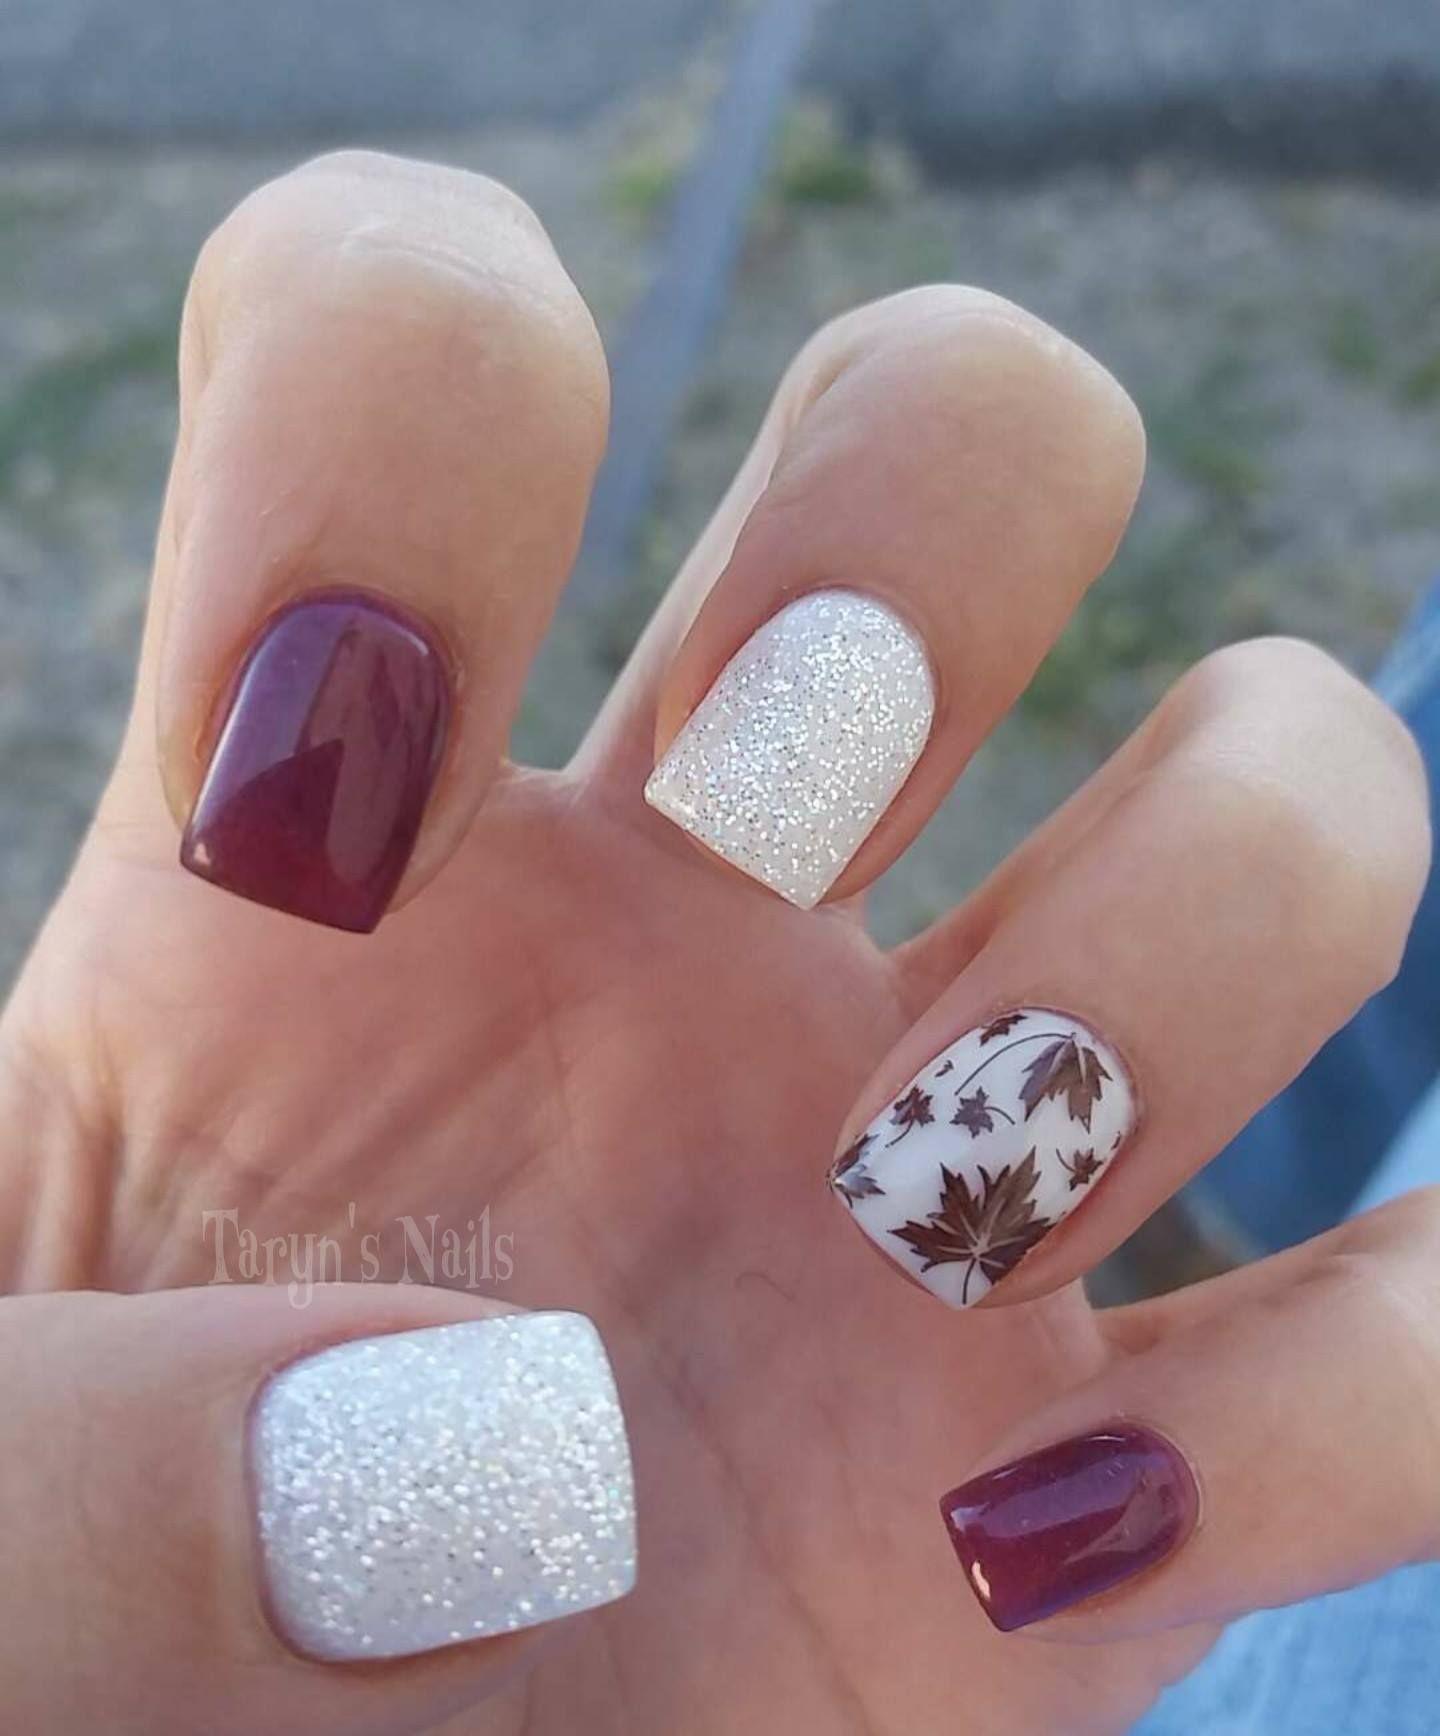 Fall nails ( https://m.facebook.com/taryns.nails/photos/pb ...